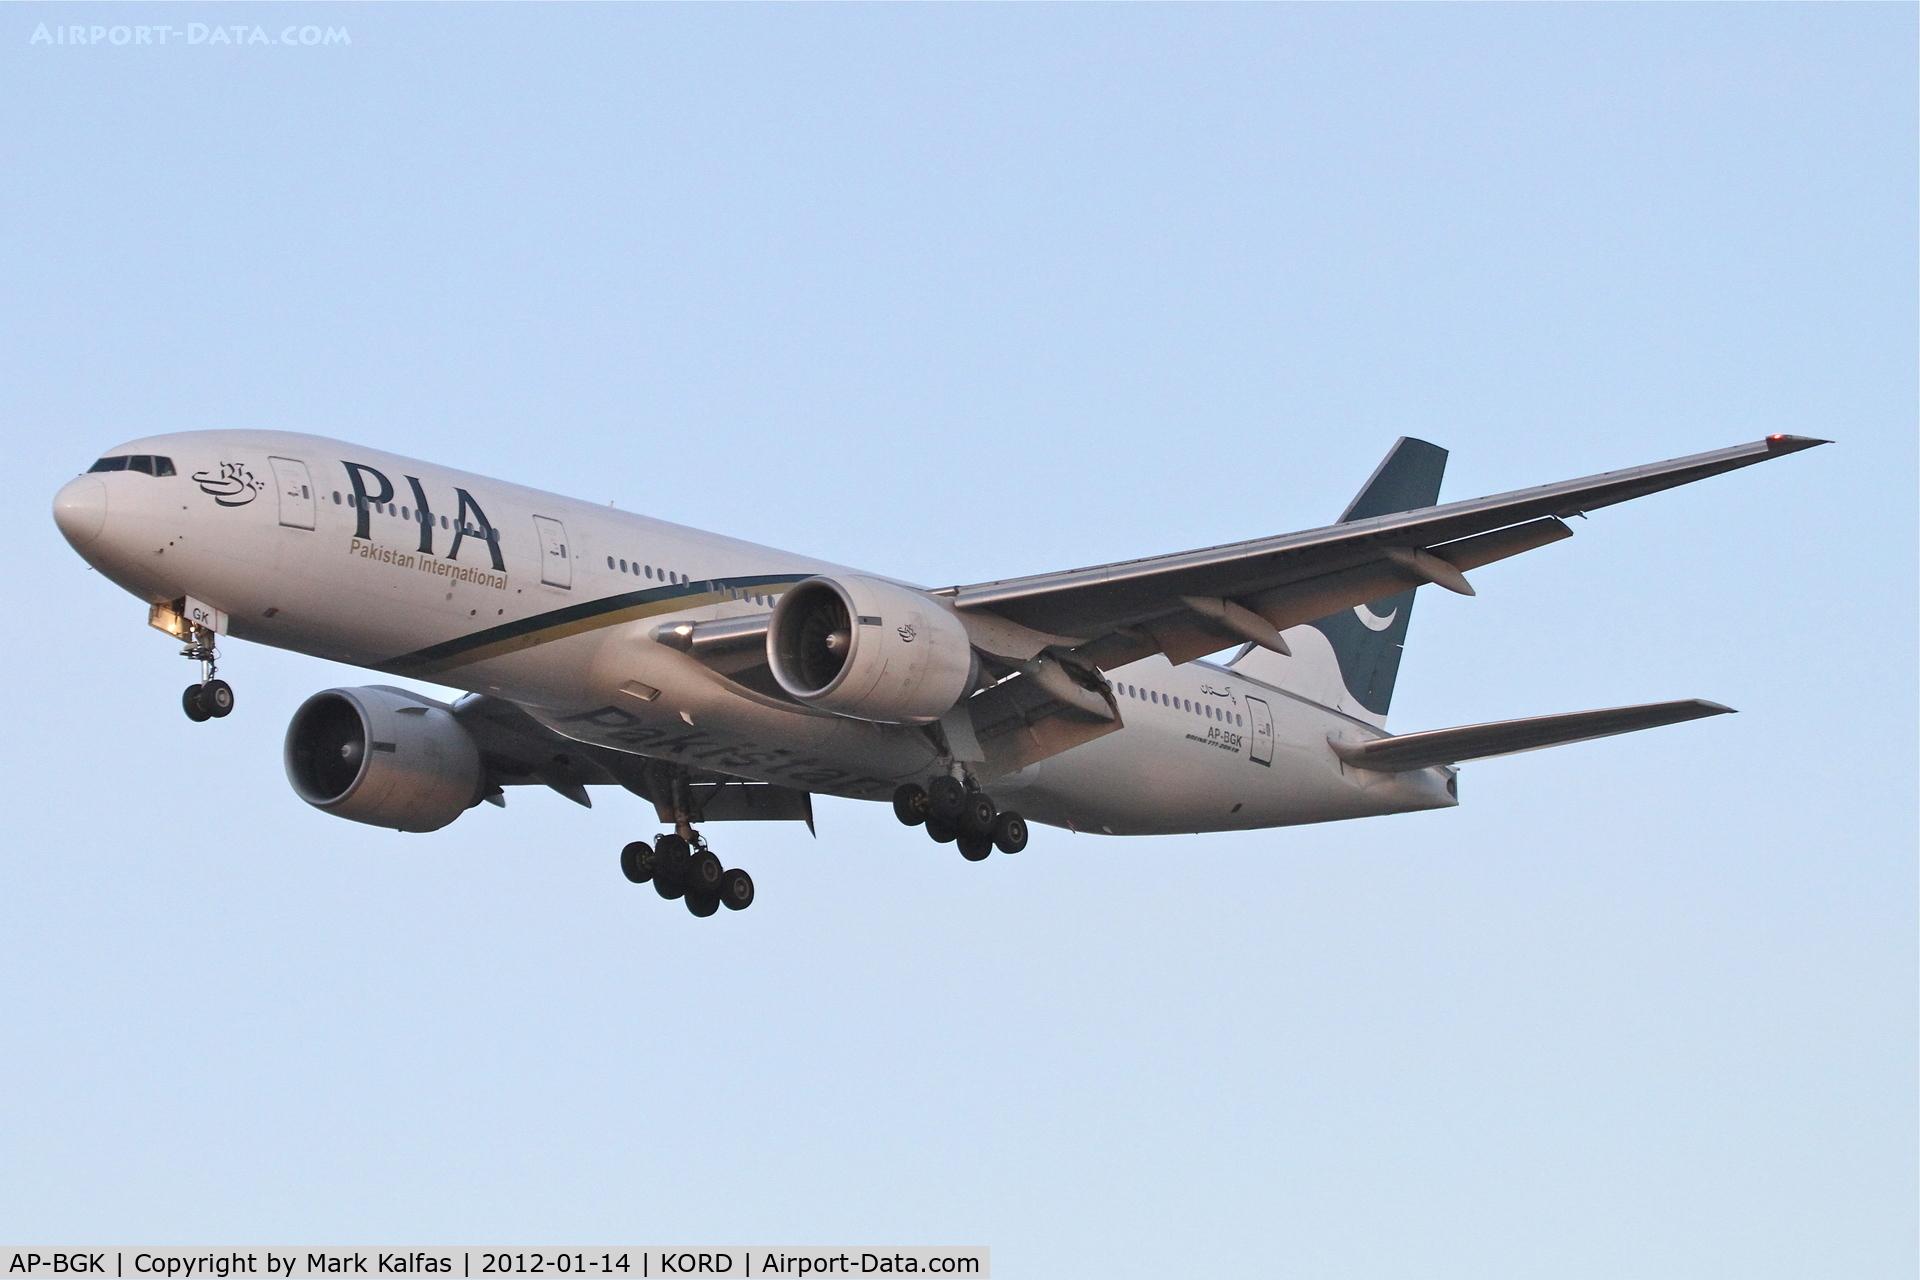 AP-BGK, 2004 Boeing 777-240/ER C/N 33776, PIA AP-BGK Boeing 777-240 on approach RWY 28 KORD.